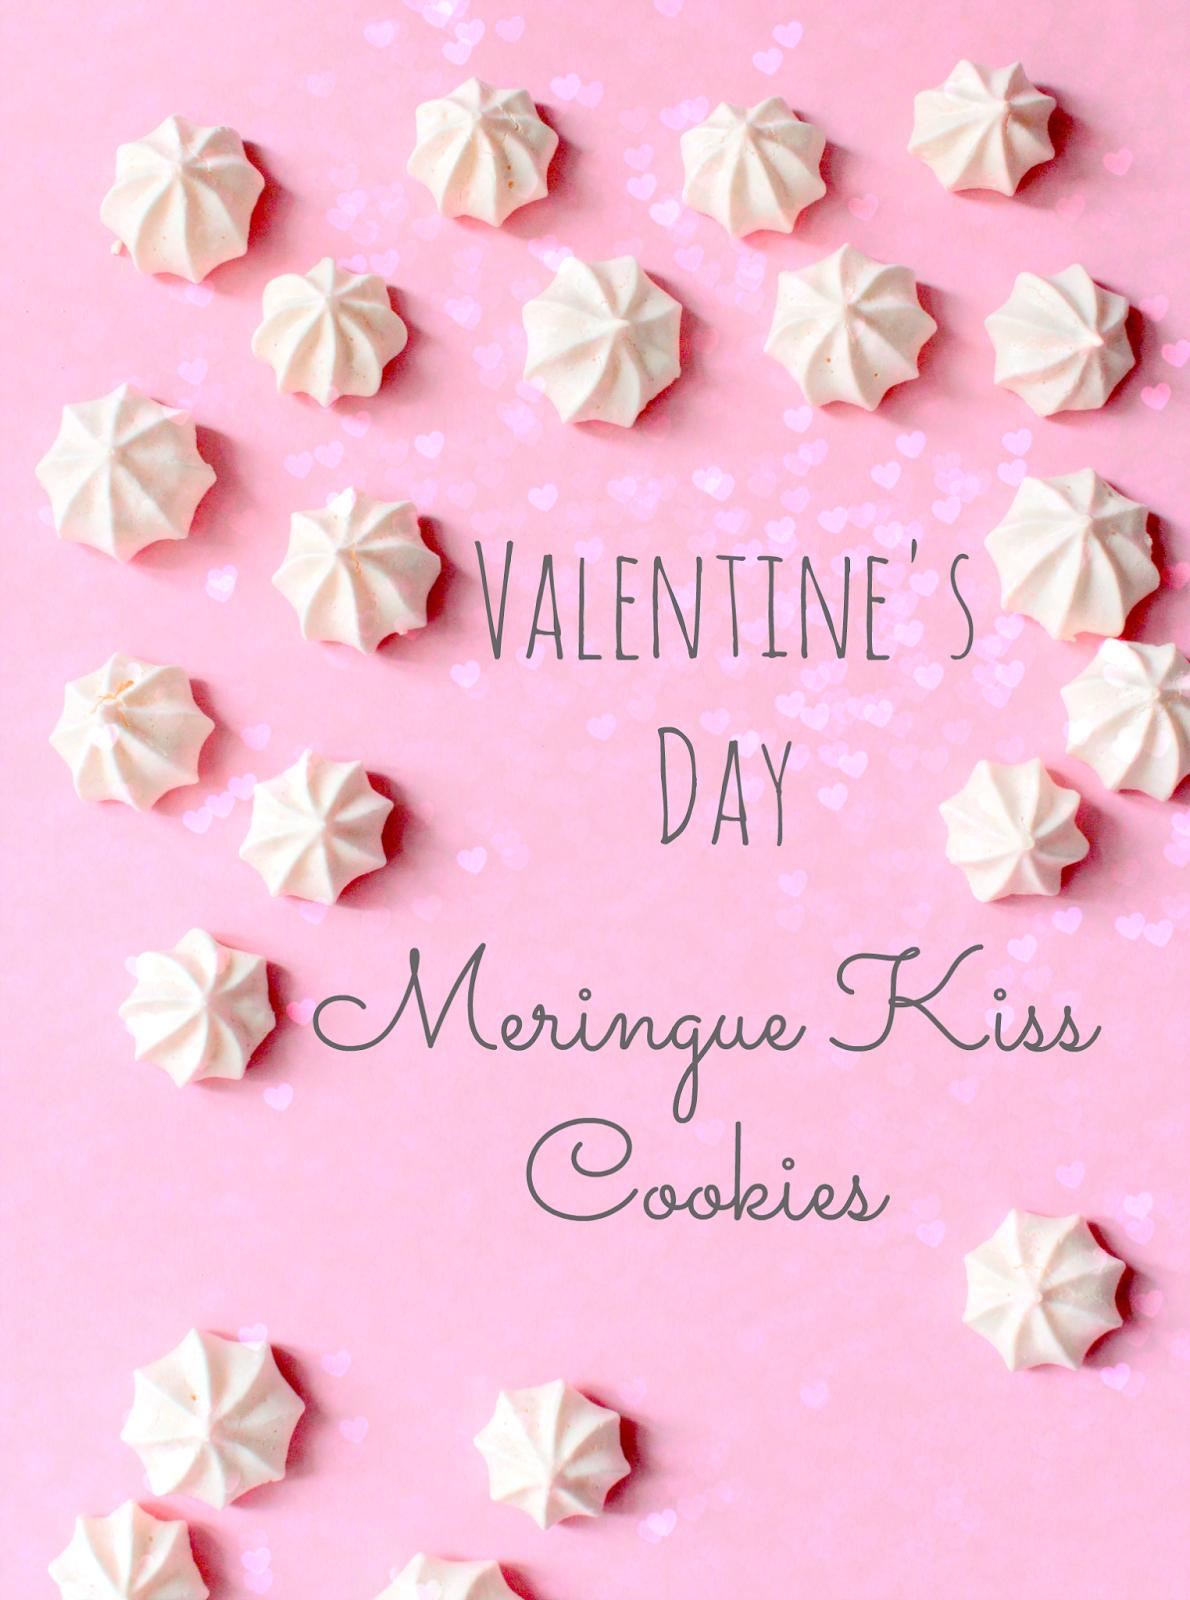 Meringue Kiss Cookies zum Valentinstag (glamourcakeberlin.blogspot.de)